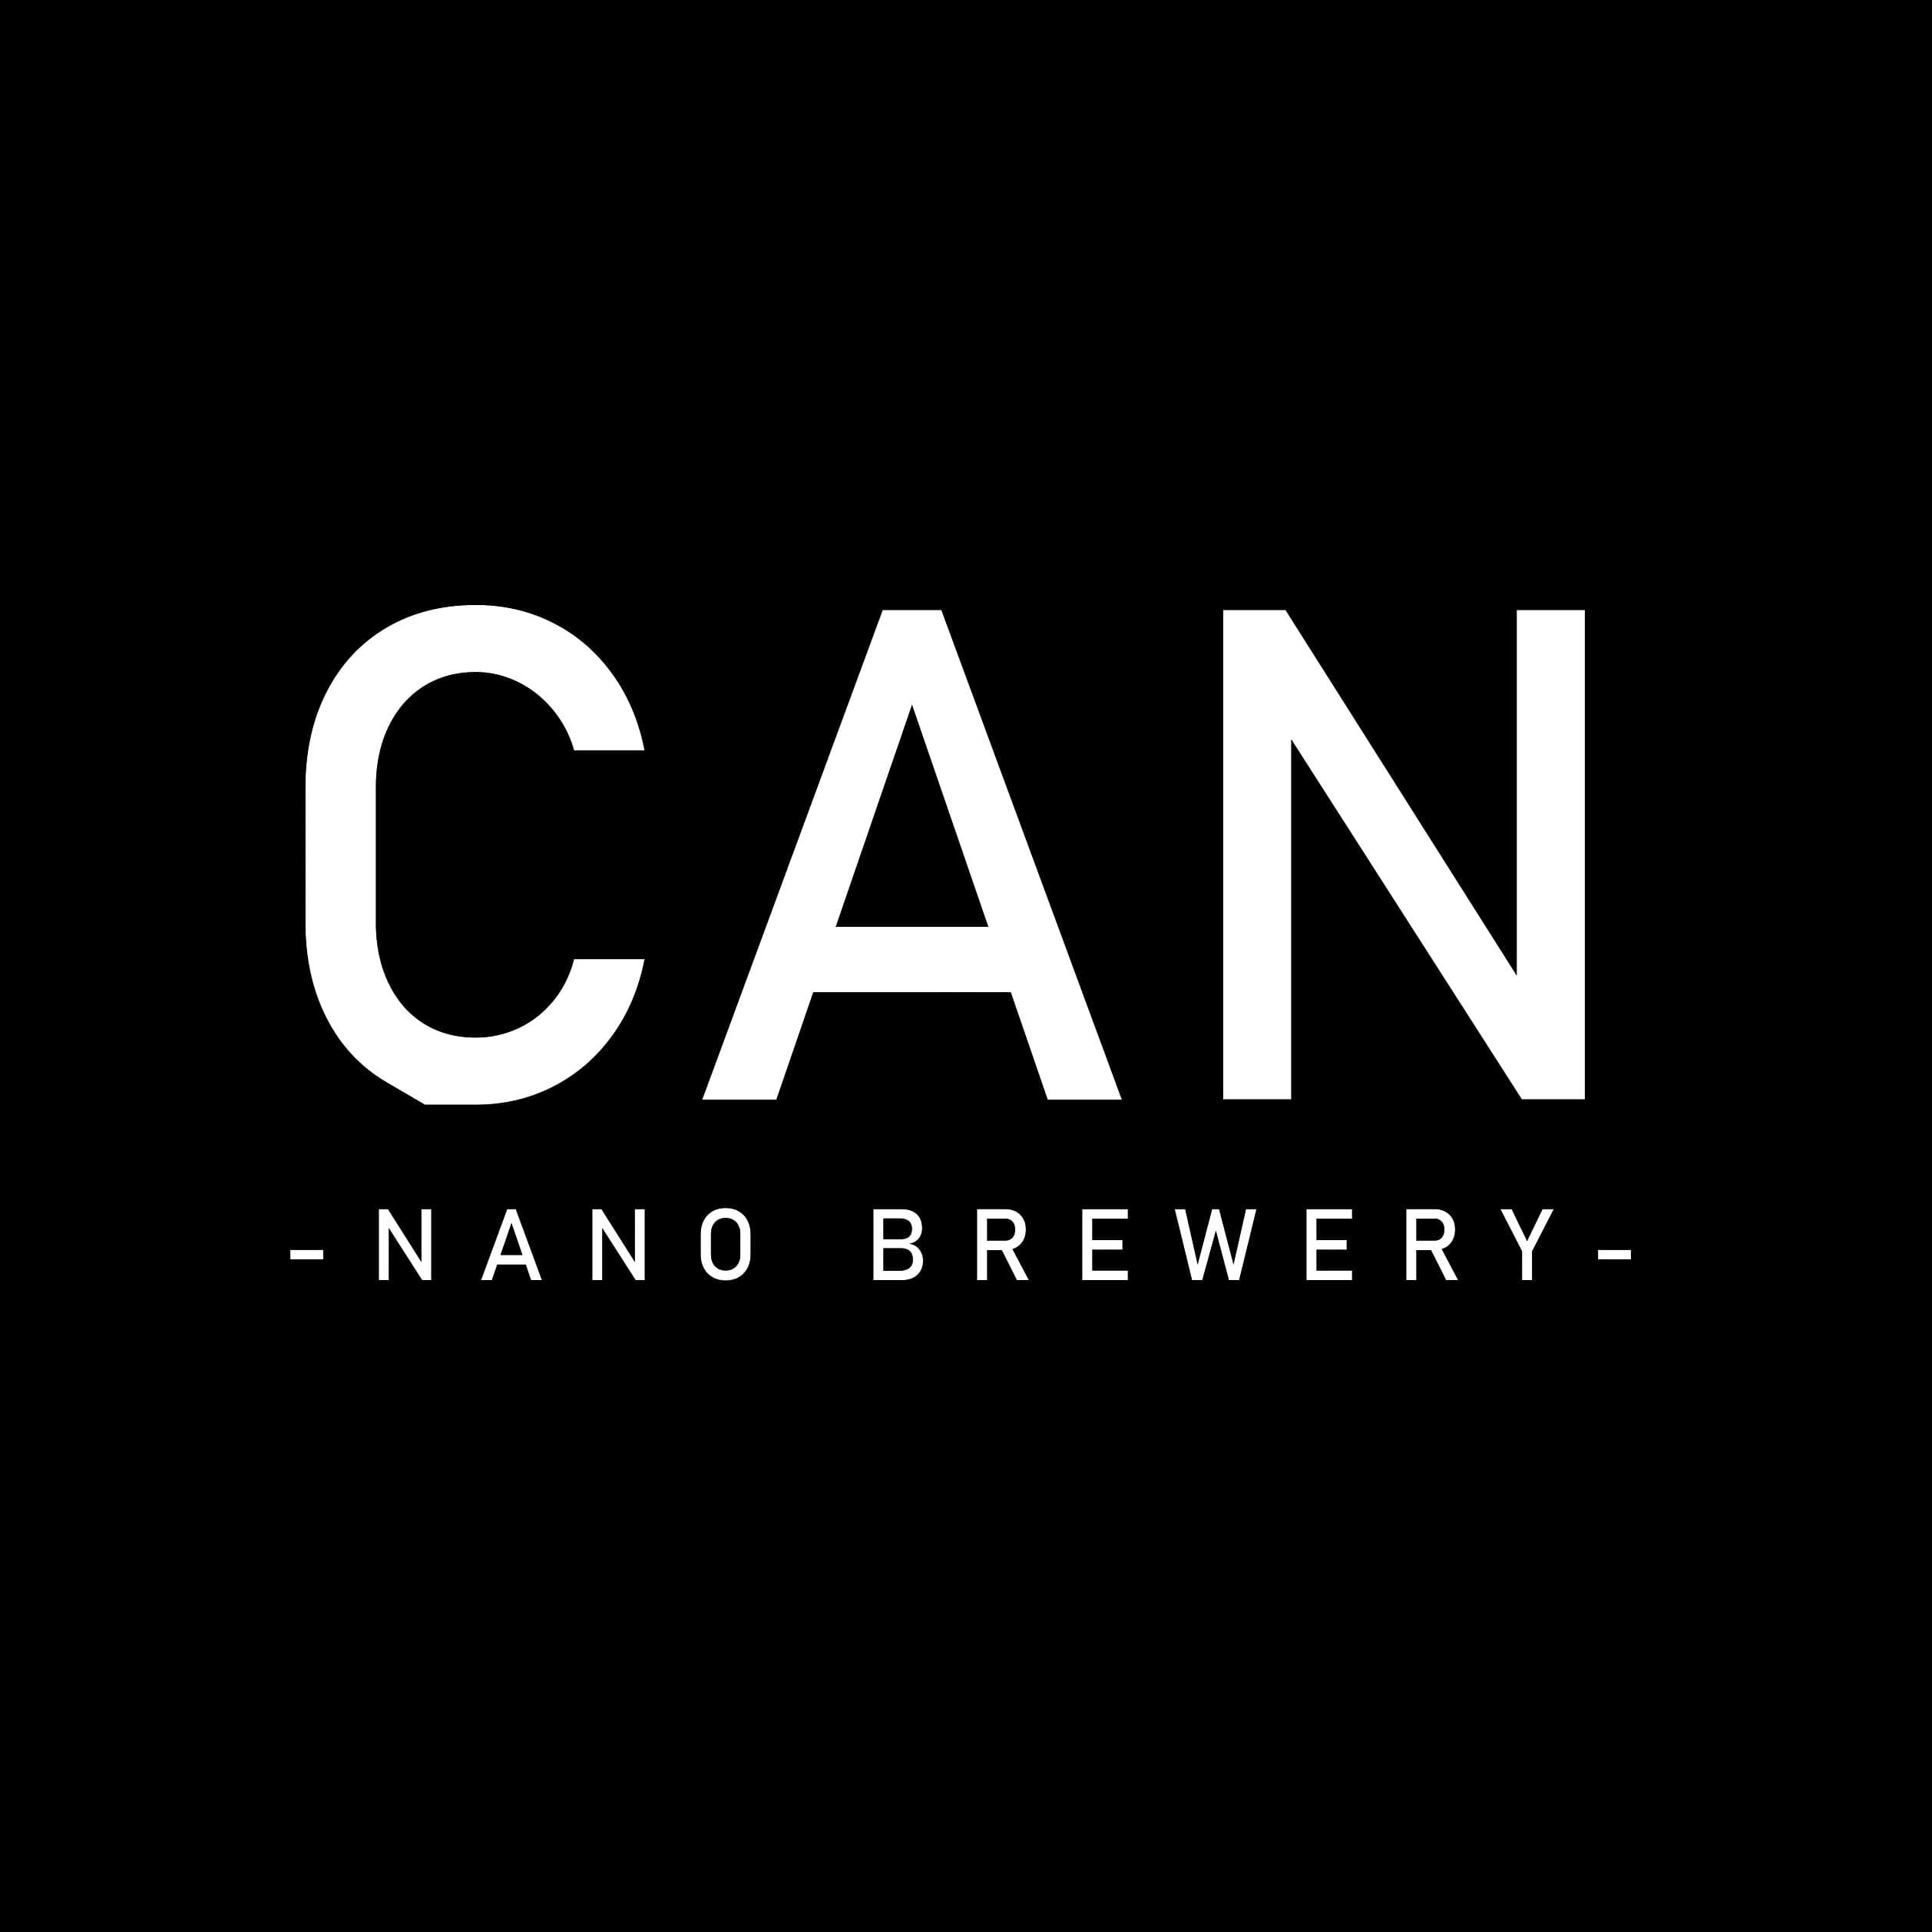 CAN Nano Brewery